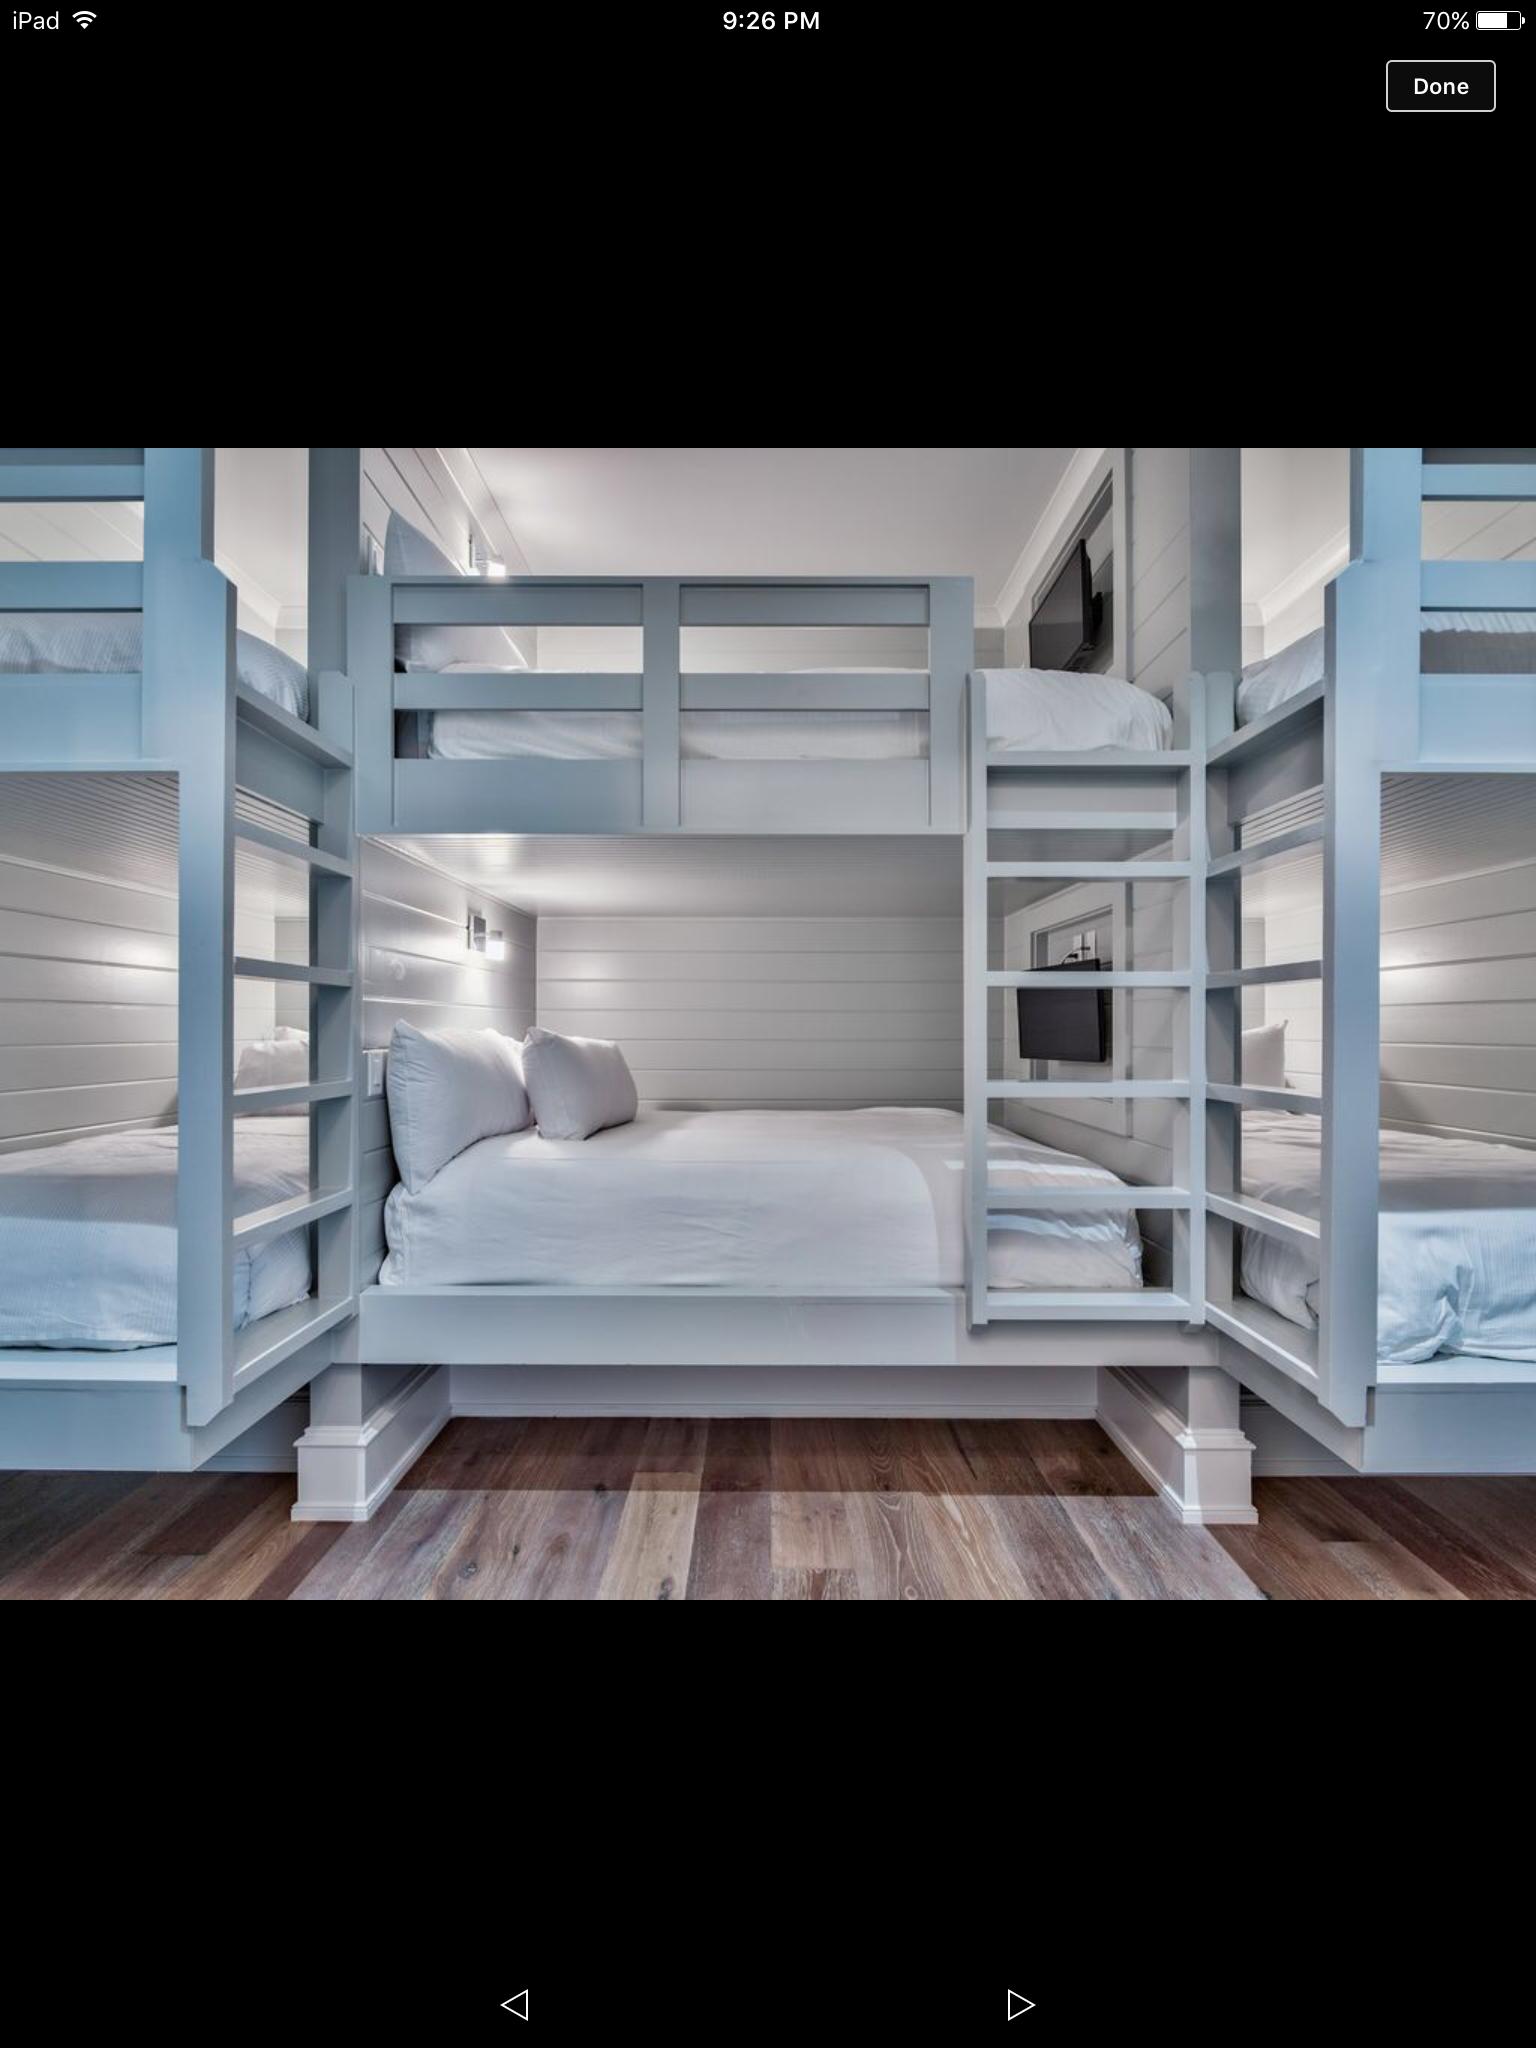 Pin By Kelli Smithmier On Bunks Kids Bedroom Designs Home Decor Bedroom Bedroom Design